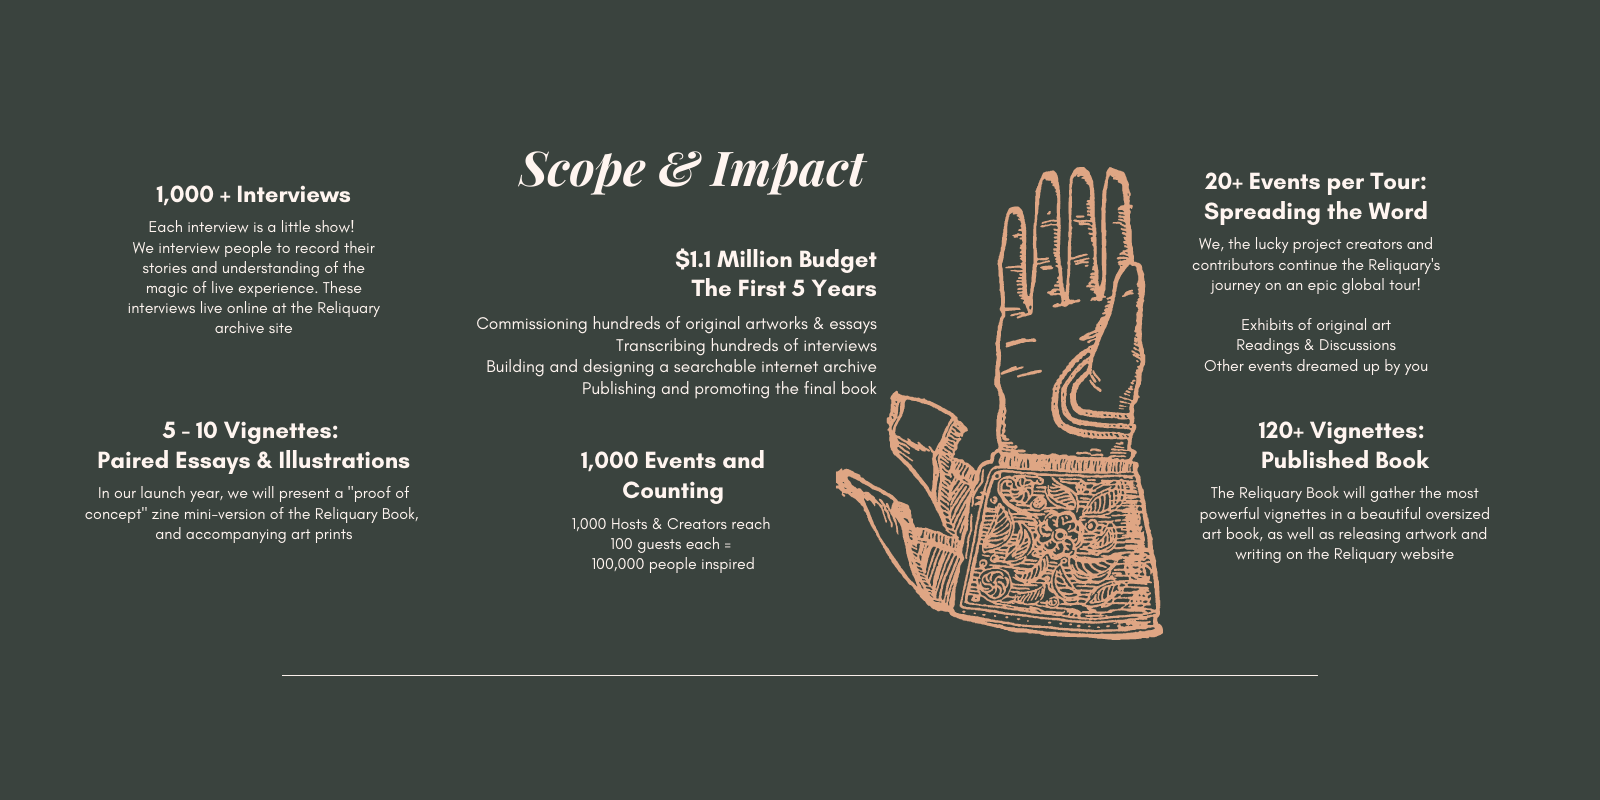 Scope & Impact